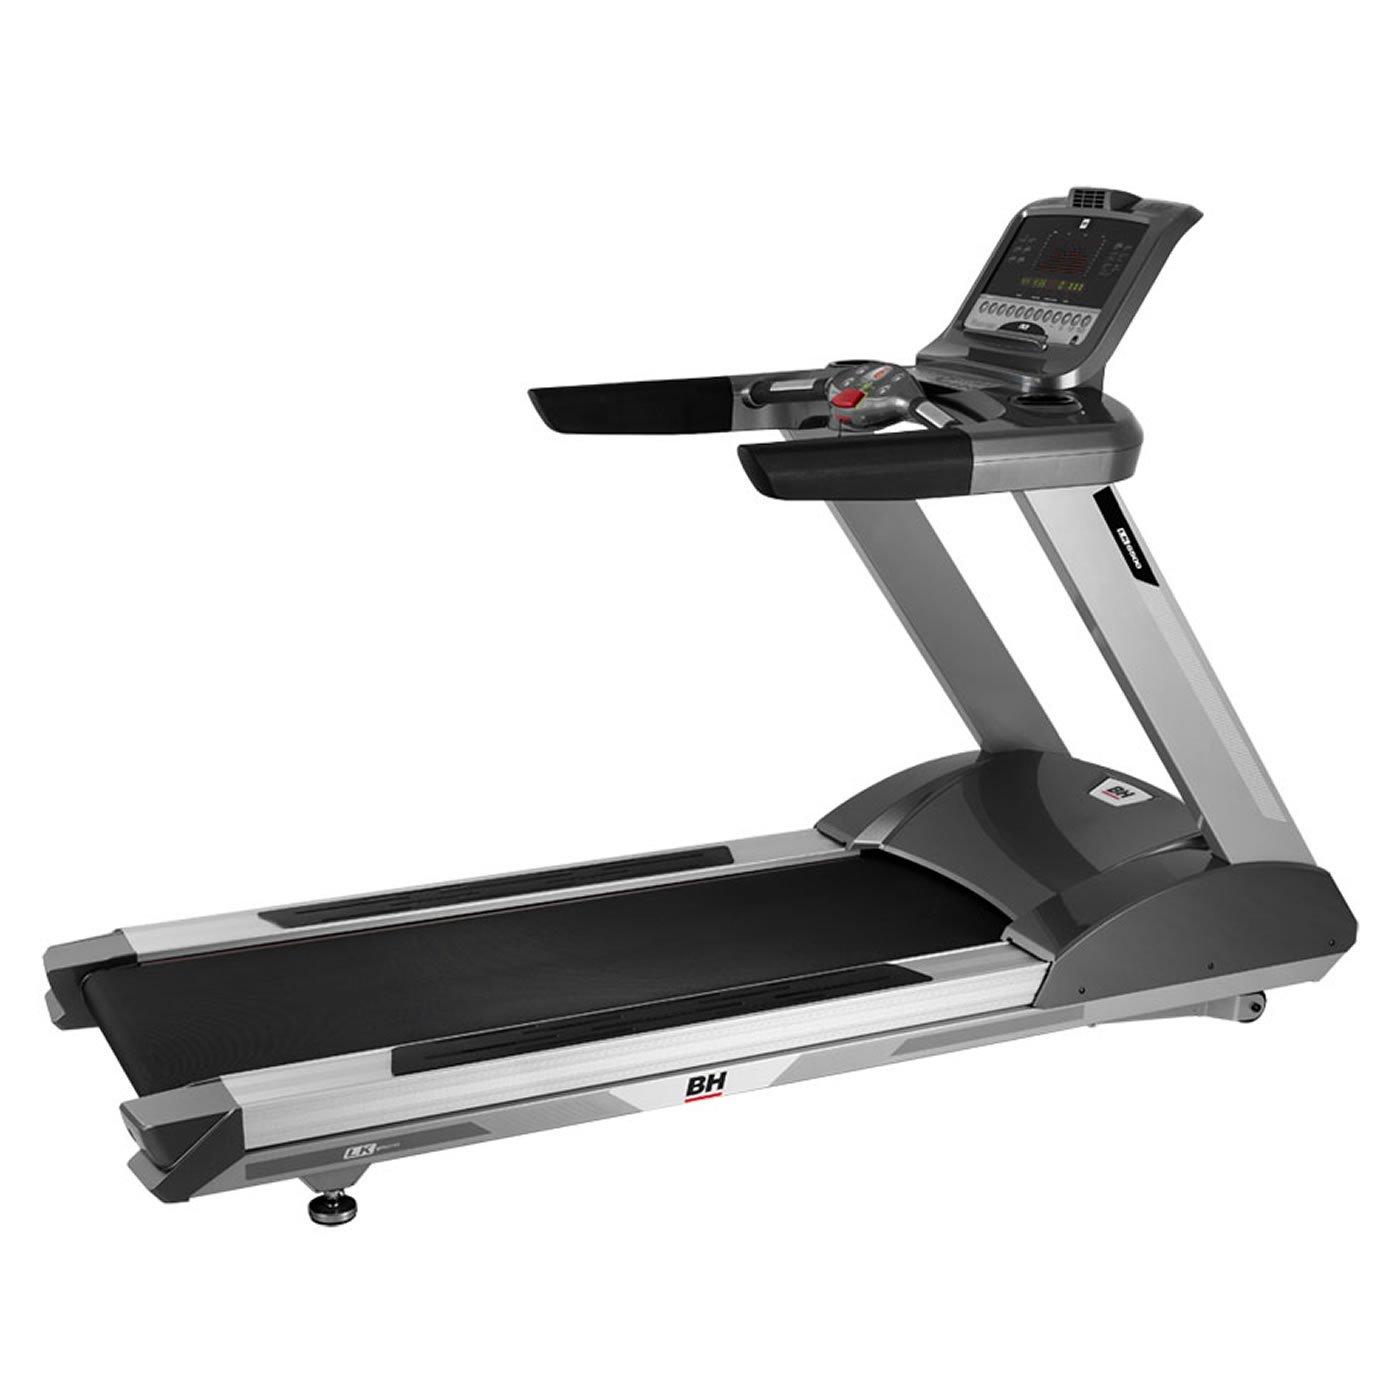 BH Fitness comerciales LK6600 correr - Cardio, gimnasio, Home-uso ...